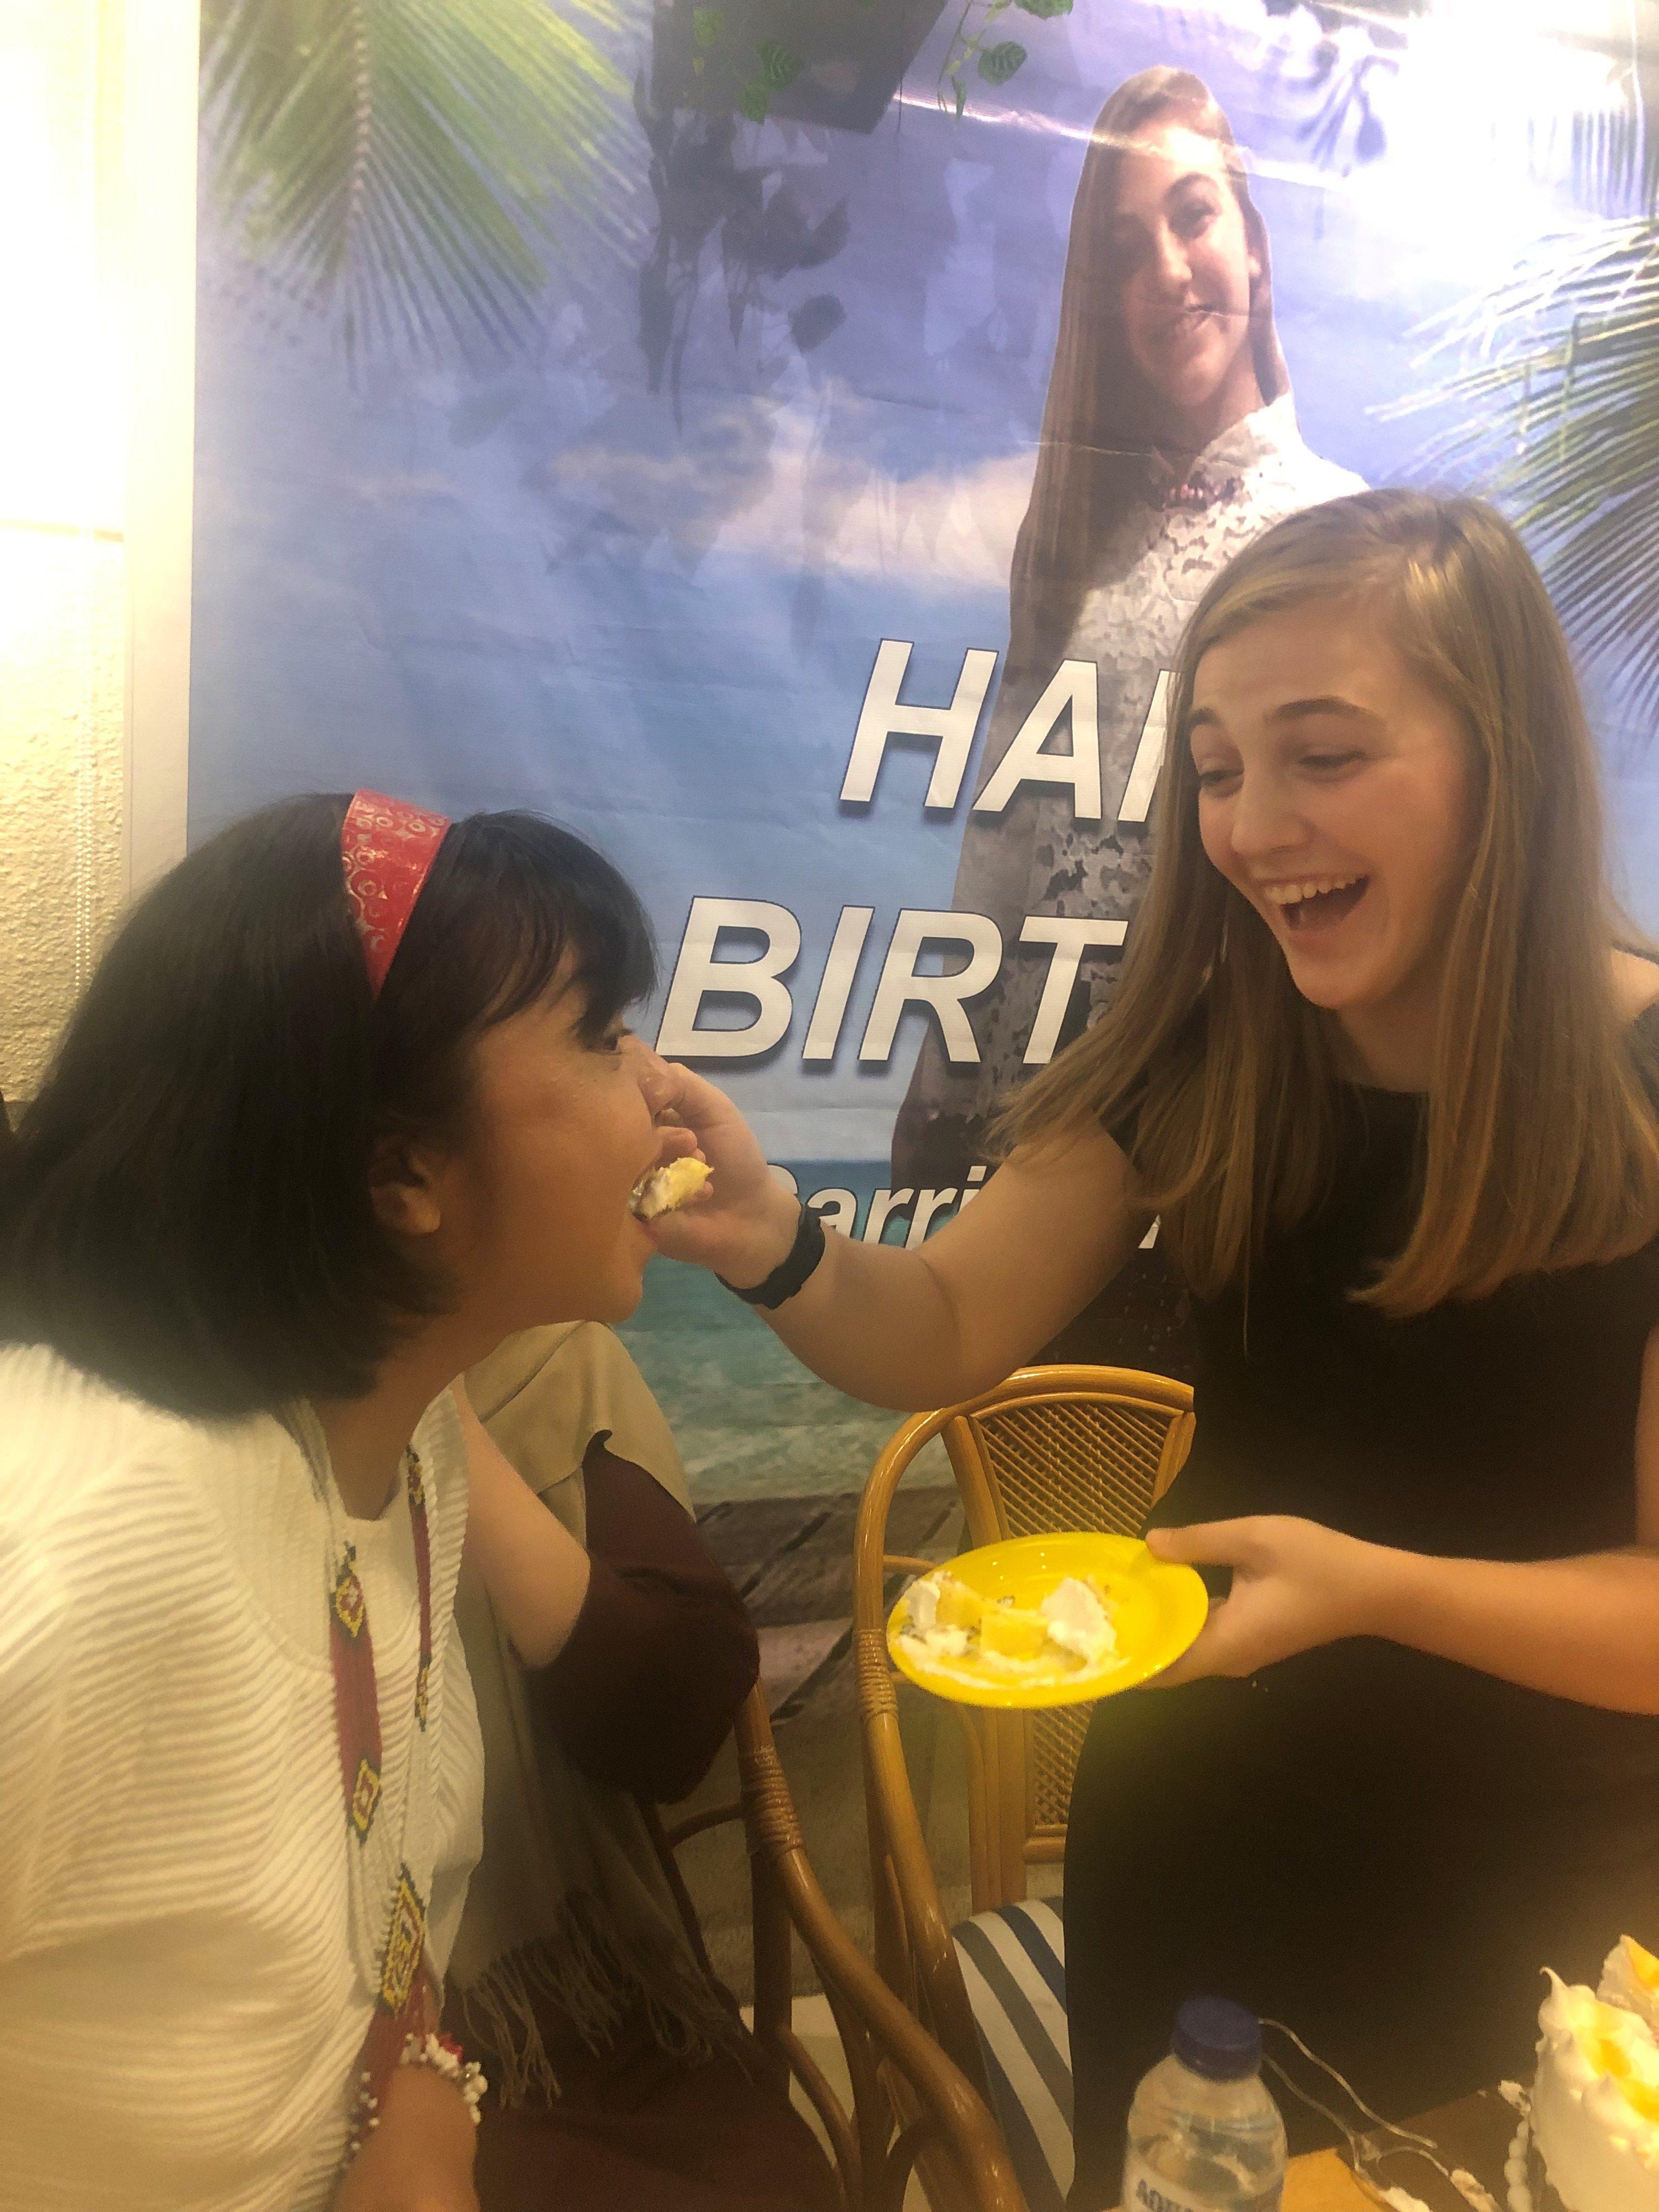 Ina Rice Carrigan Feeding Cake To Friend